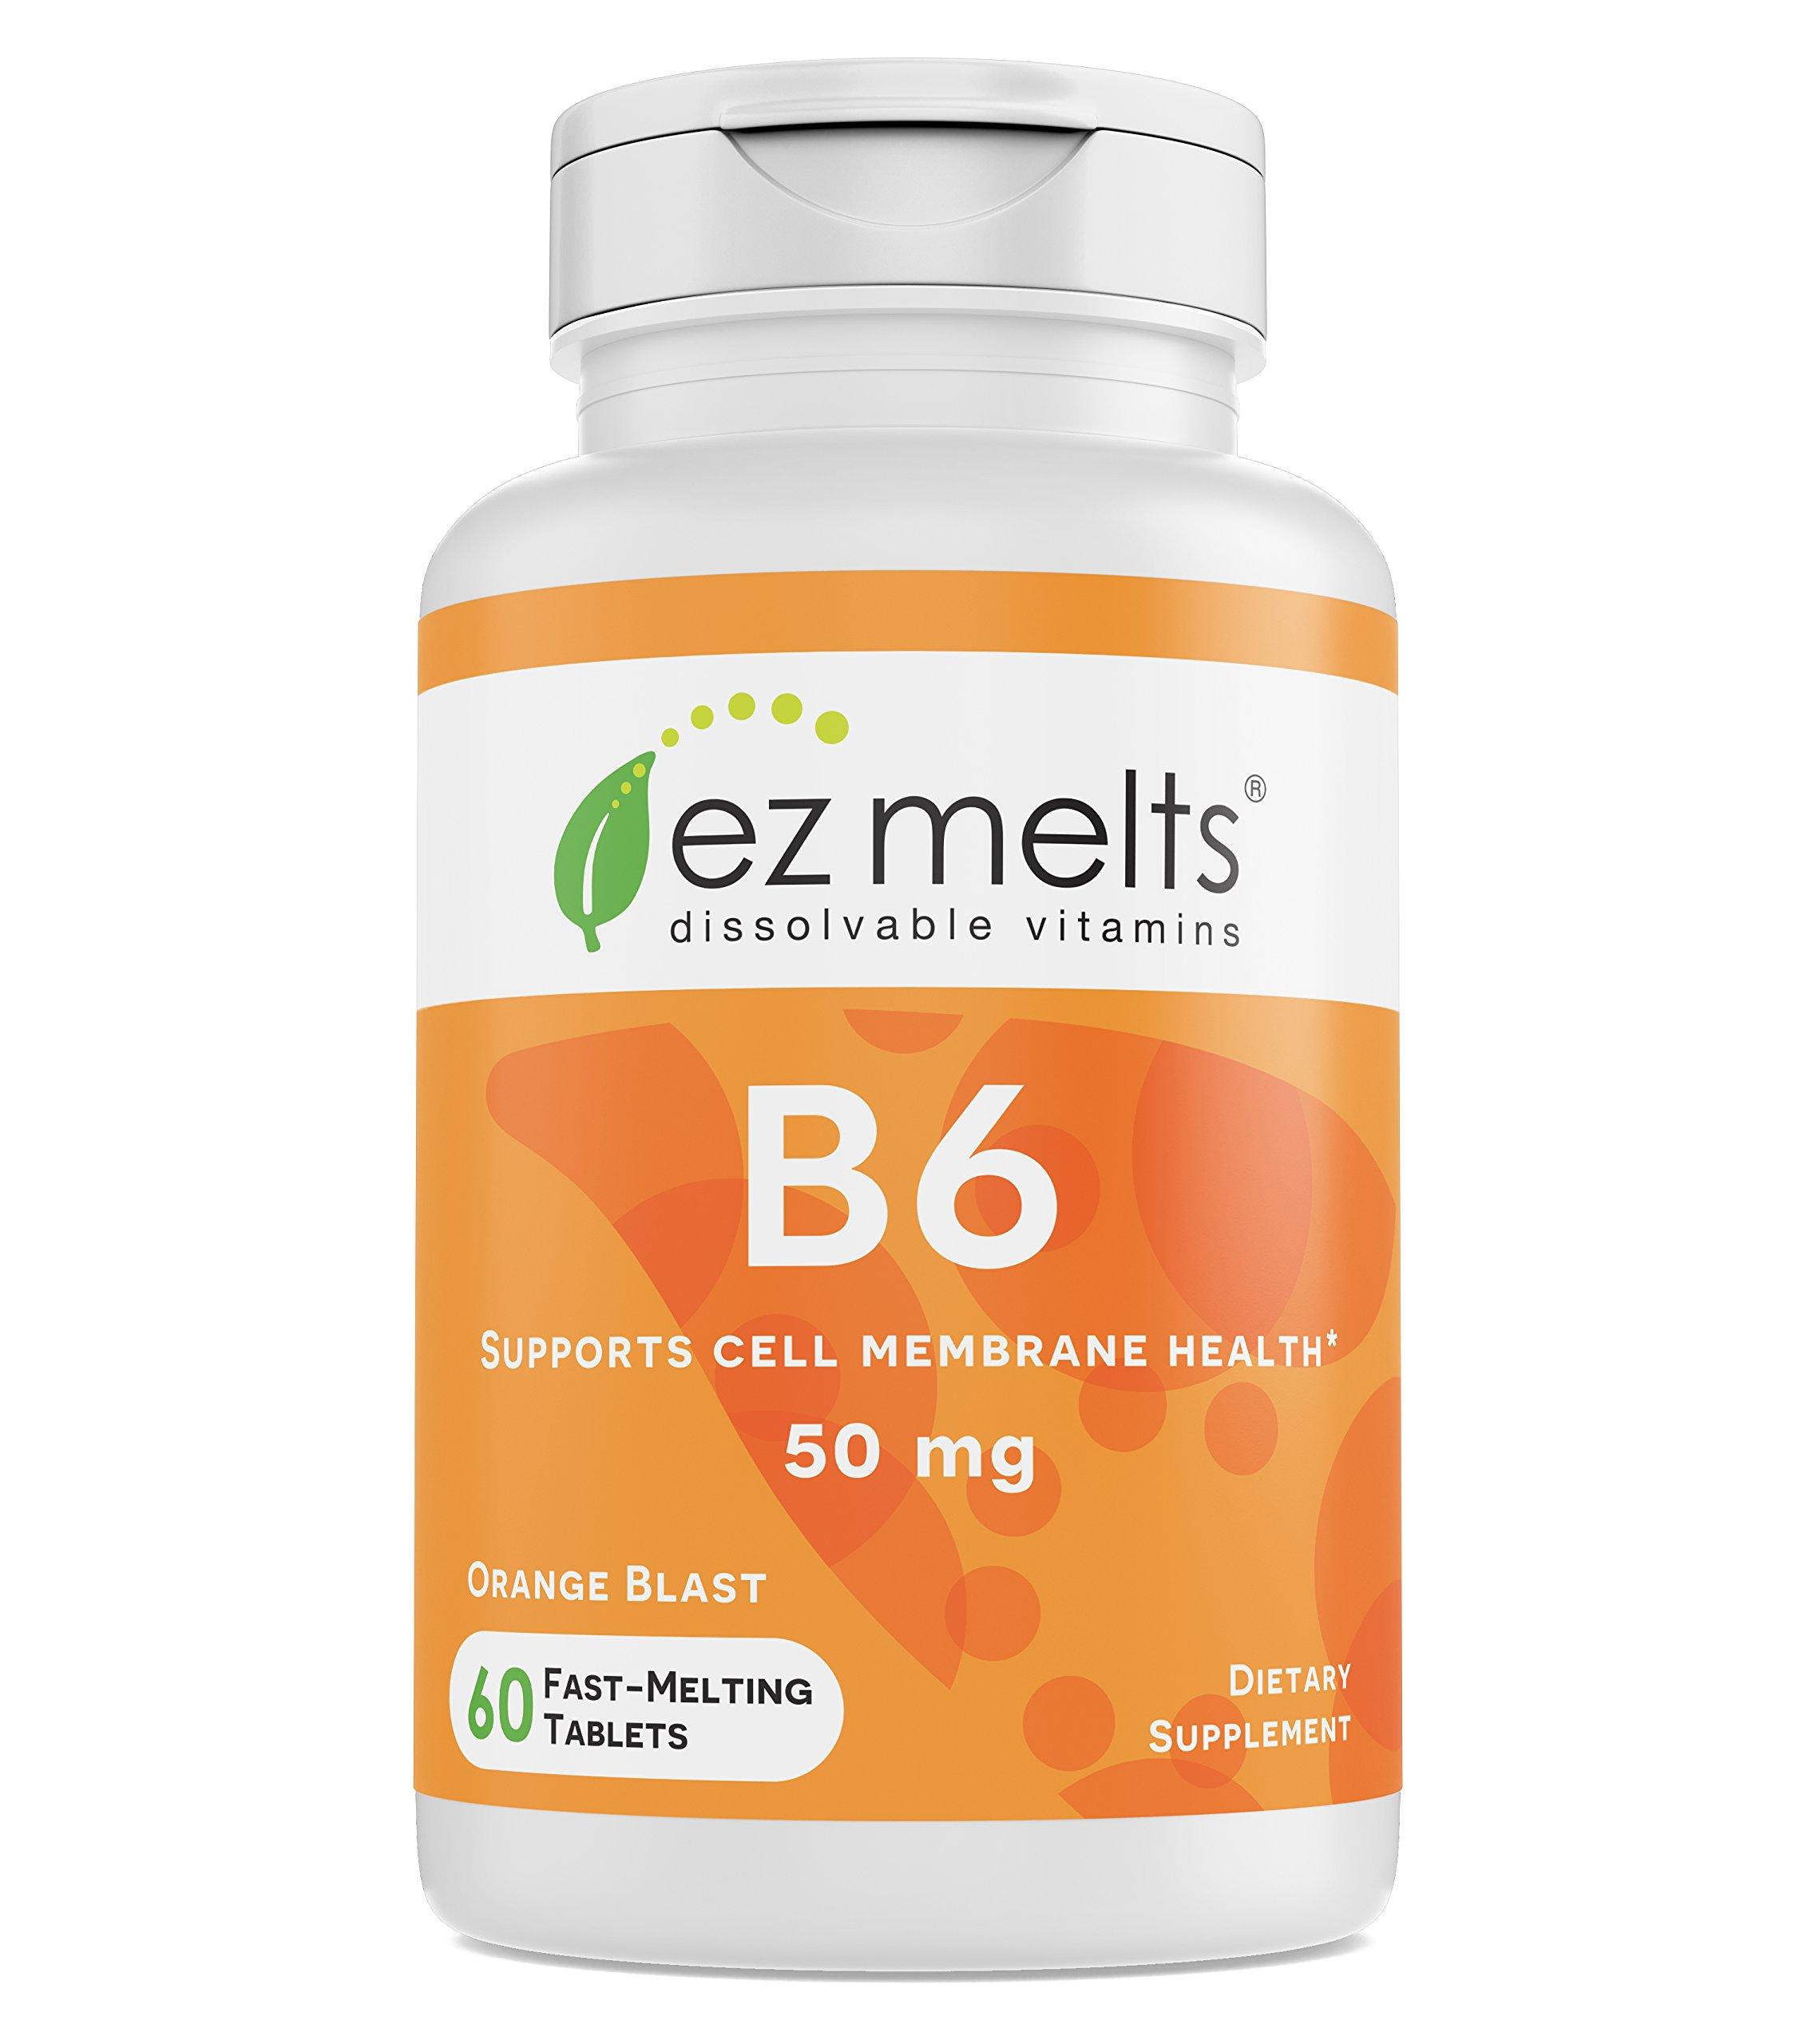 EZ Melts B6 as Pyridoxine, 50 mg, Sublingual Vitamins, Vegan, Zero Sugar, Natural Orange Flavor, 60 Fast Dissolve Tablets